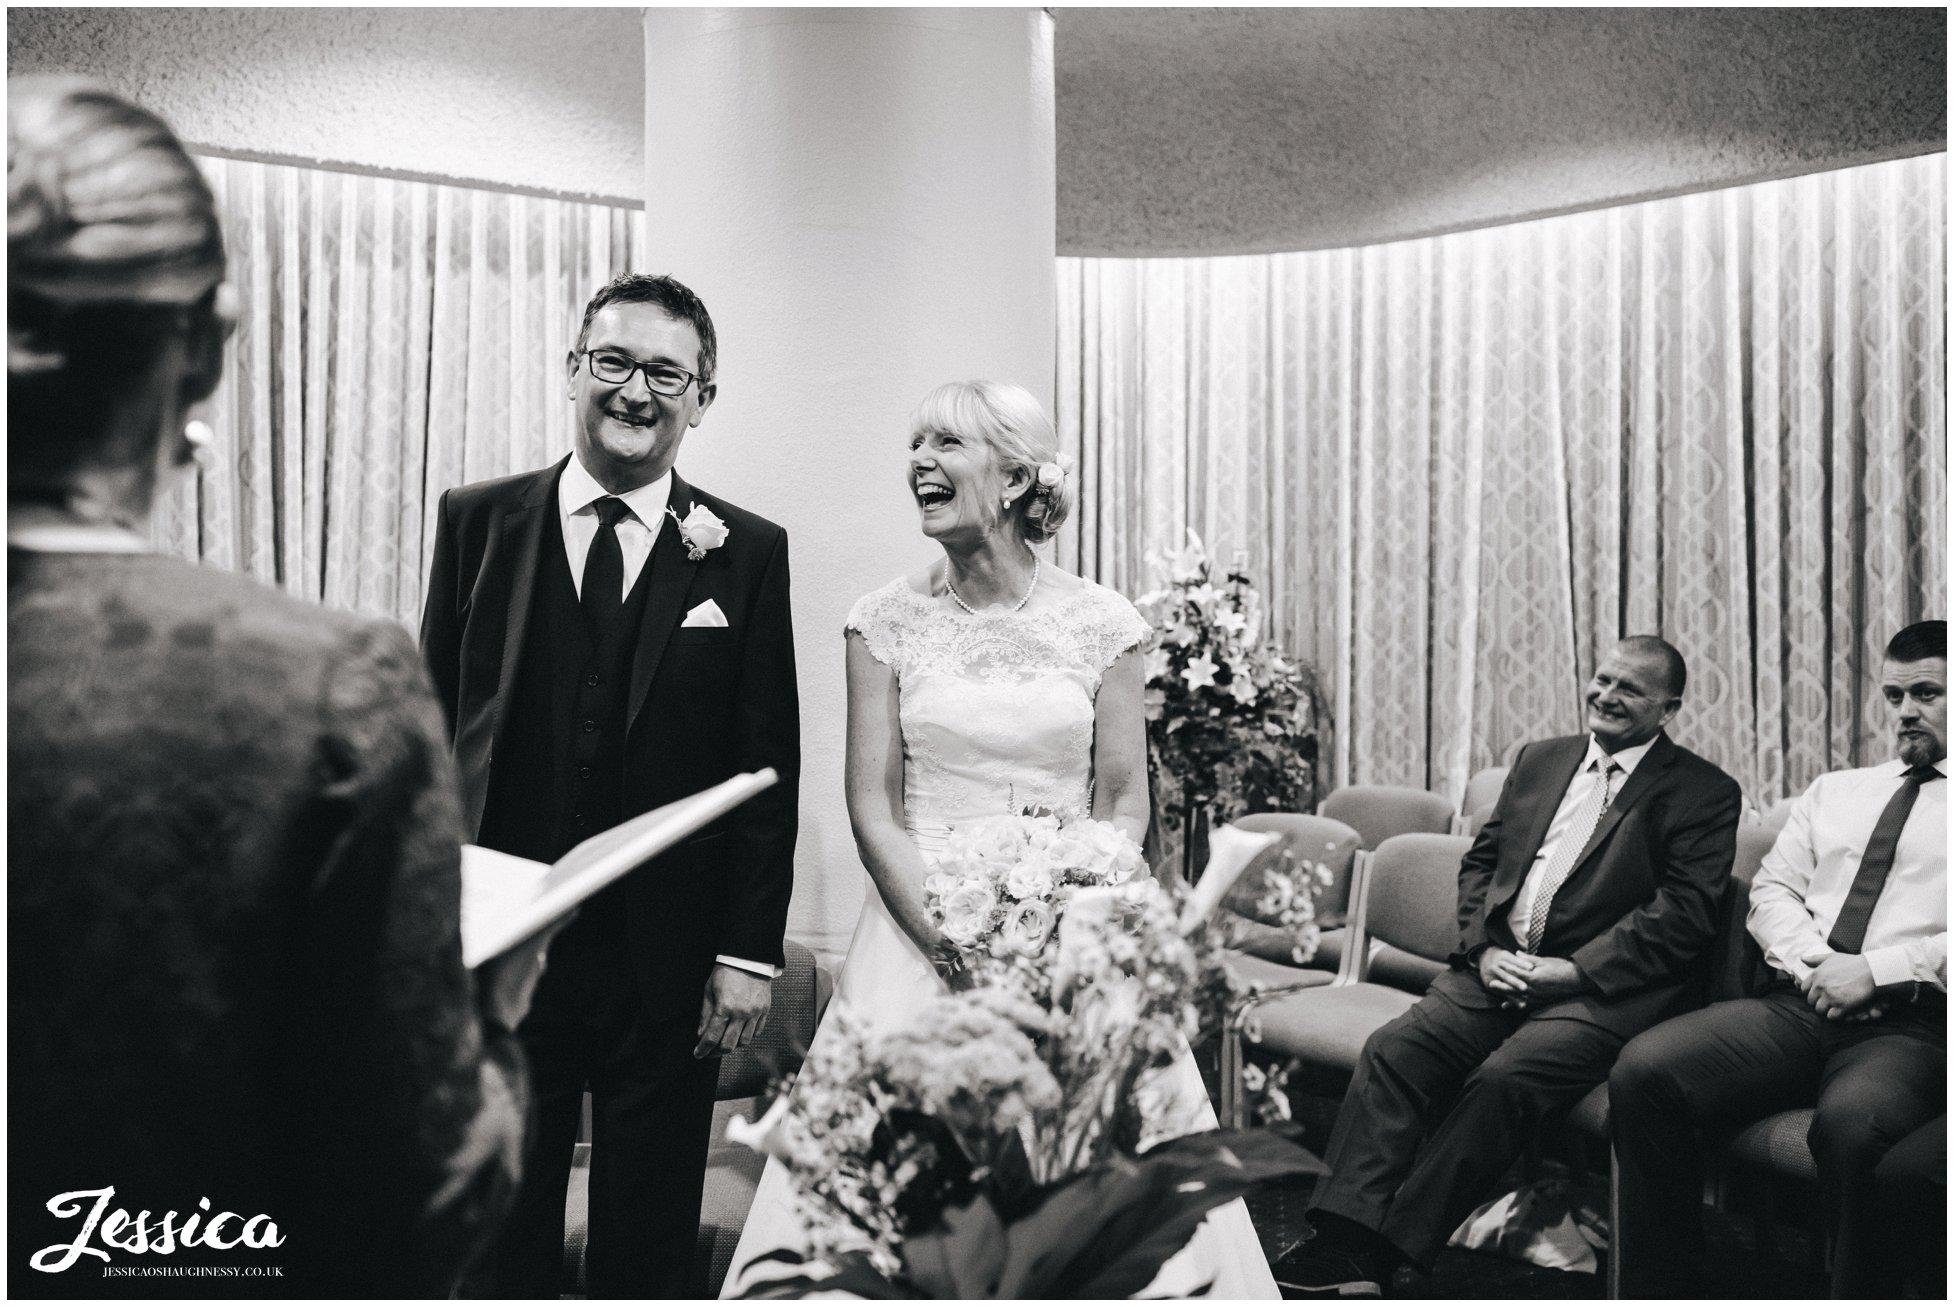 bride & groom at their wedding in chester registry office